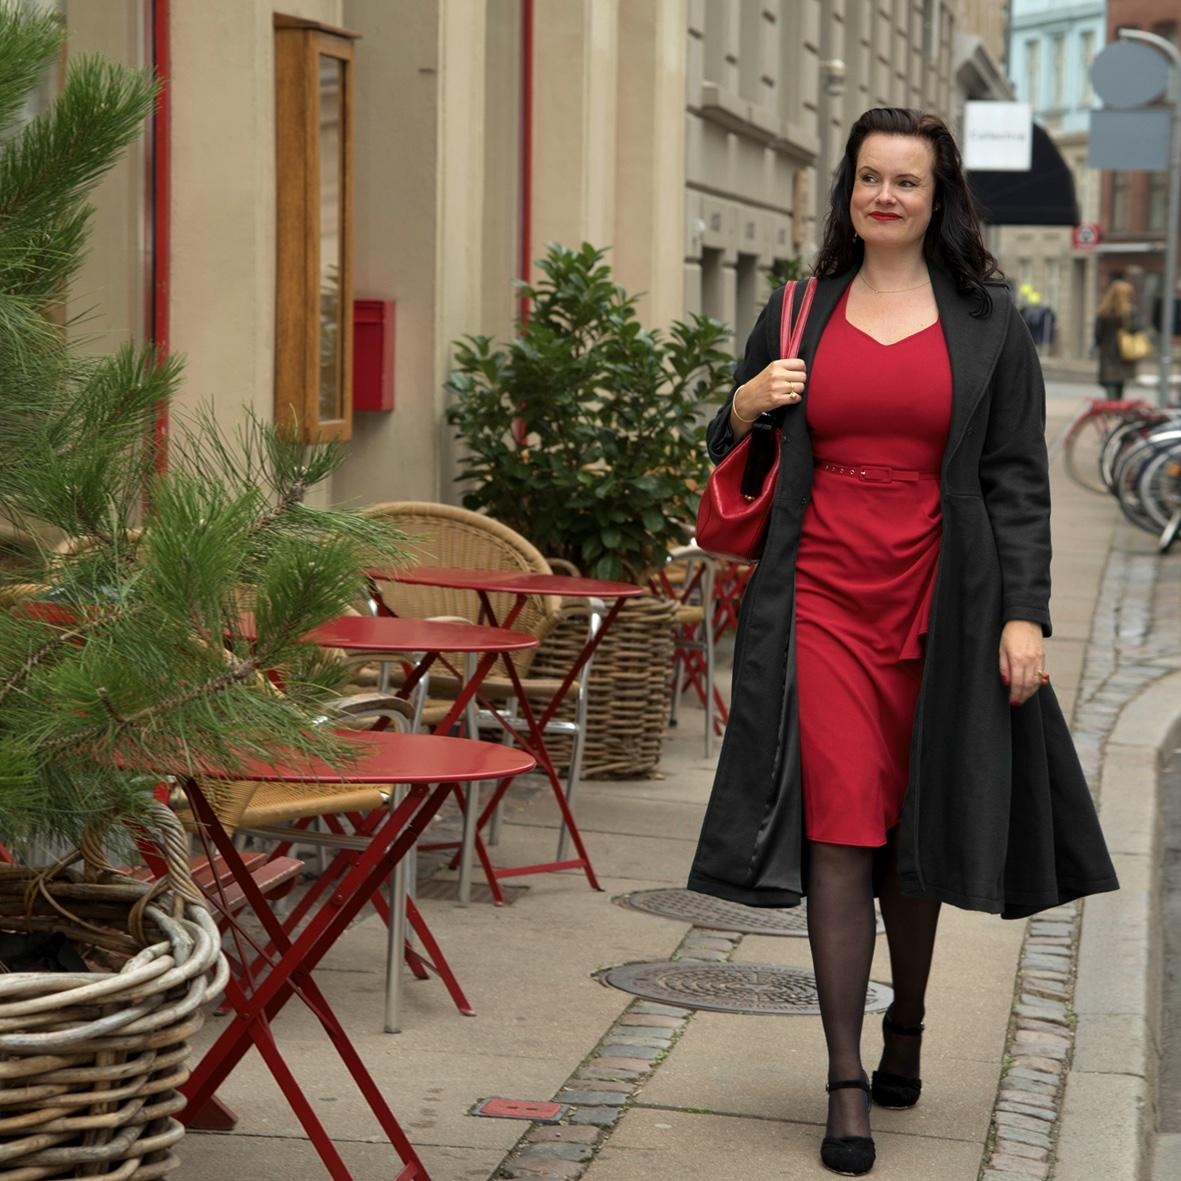 Leonora Christina Skov in clothes from Mondo Kaos